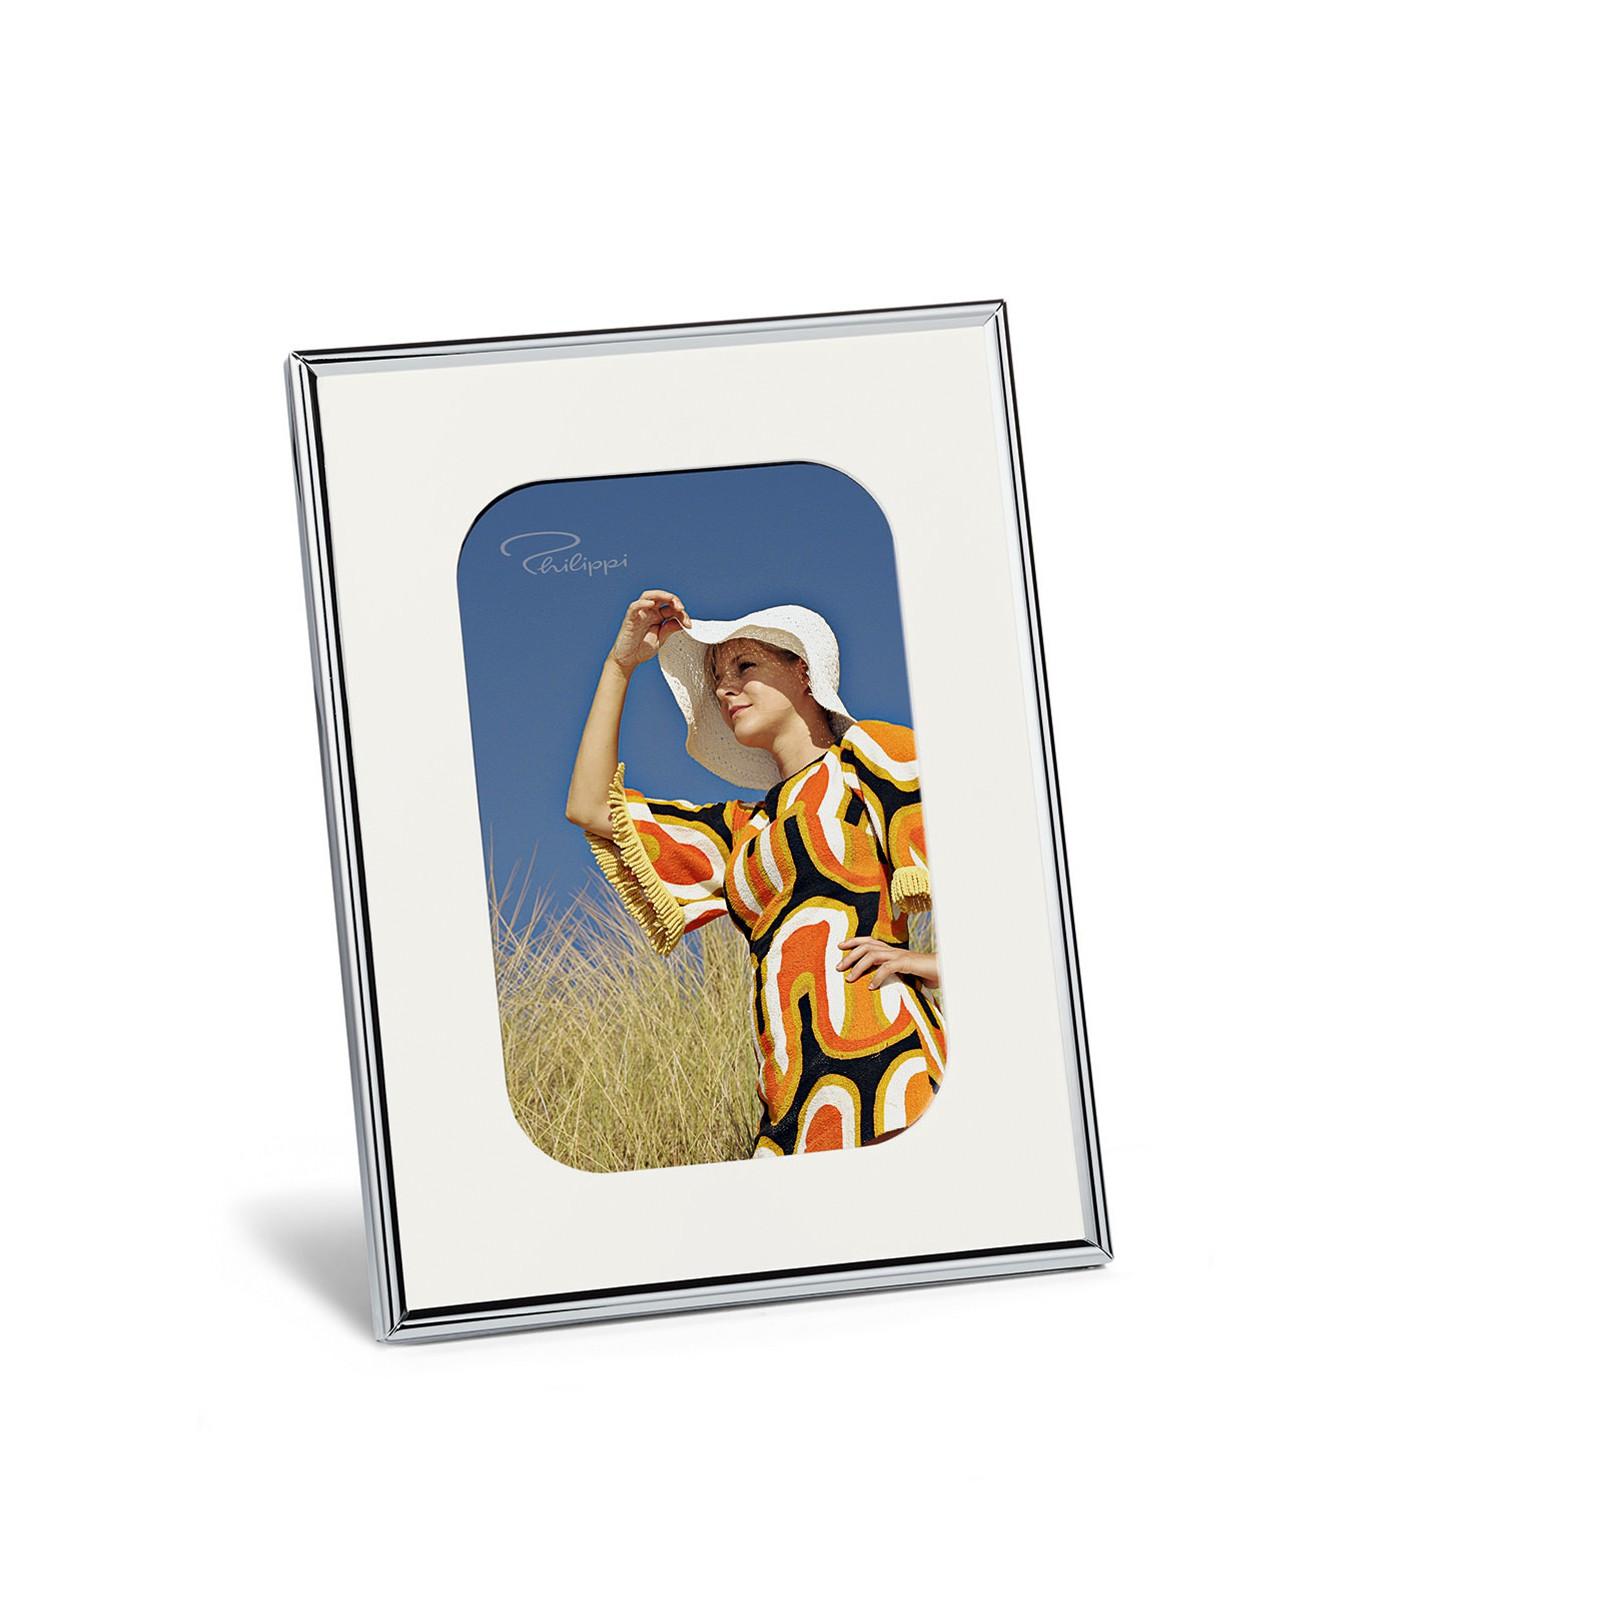 Philippi Chic Bilderrahmen Stahl verchromt 10 x 15 cm